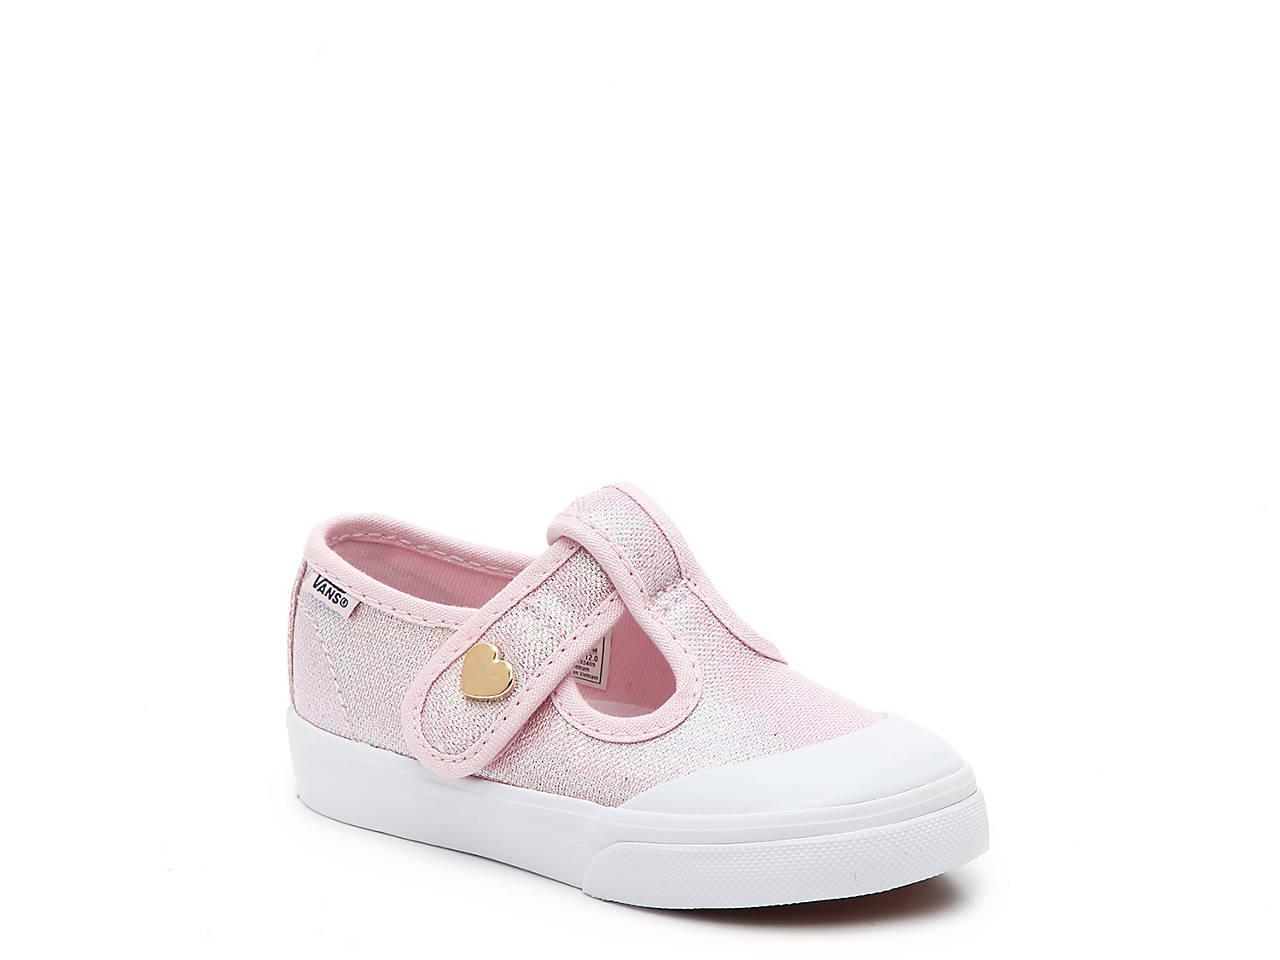 175dfb1b4533 Vans Leena Infant   Toddler Mary Jane Sneaker Kids Shoes